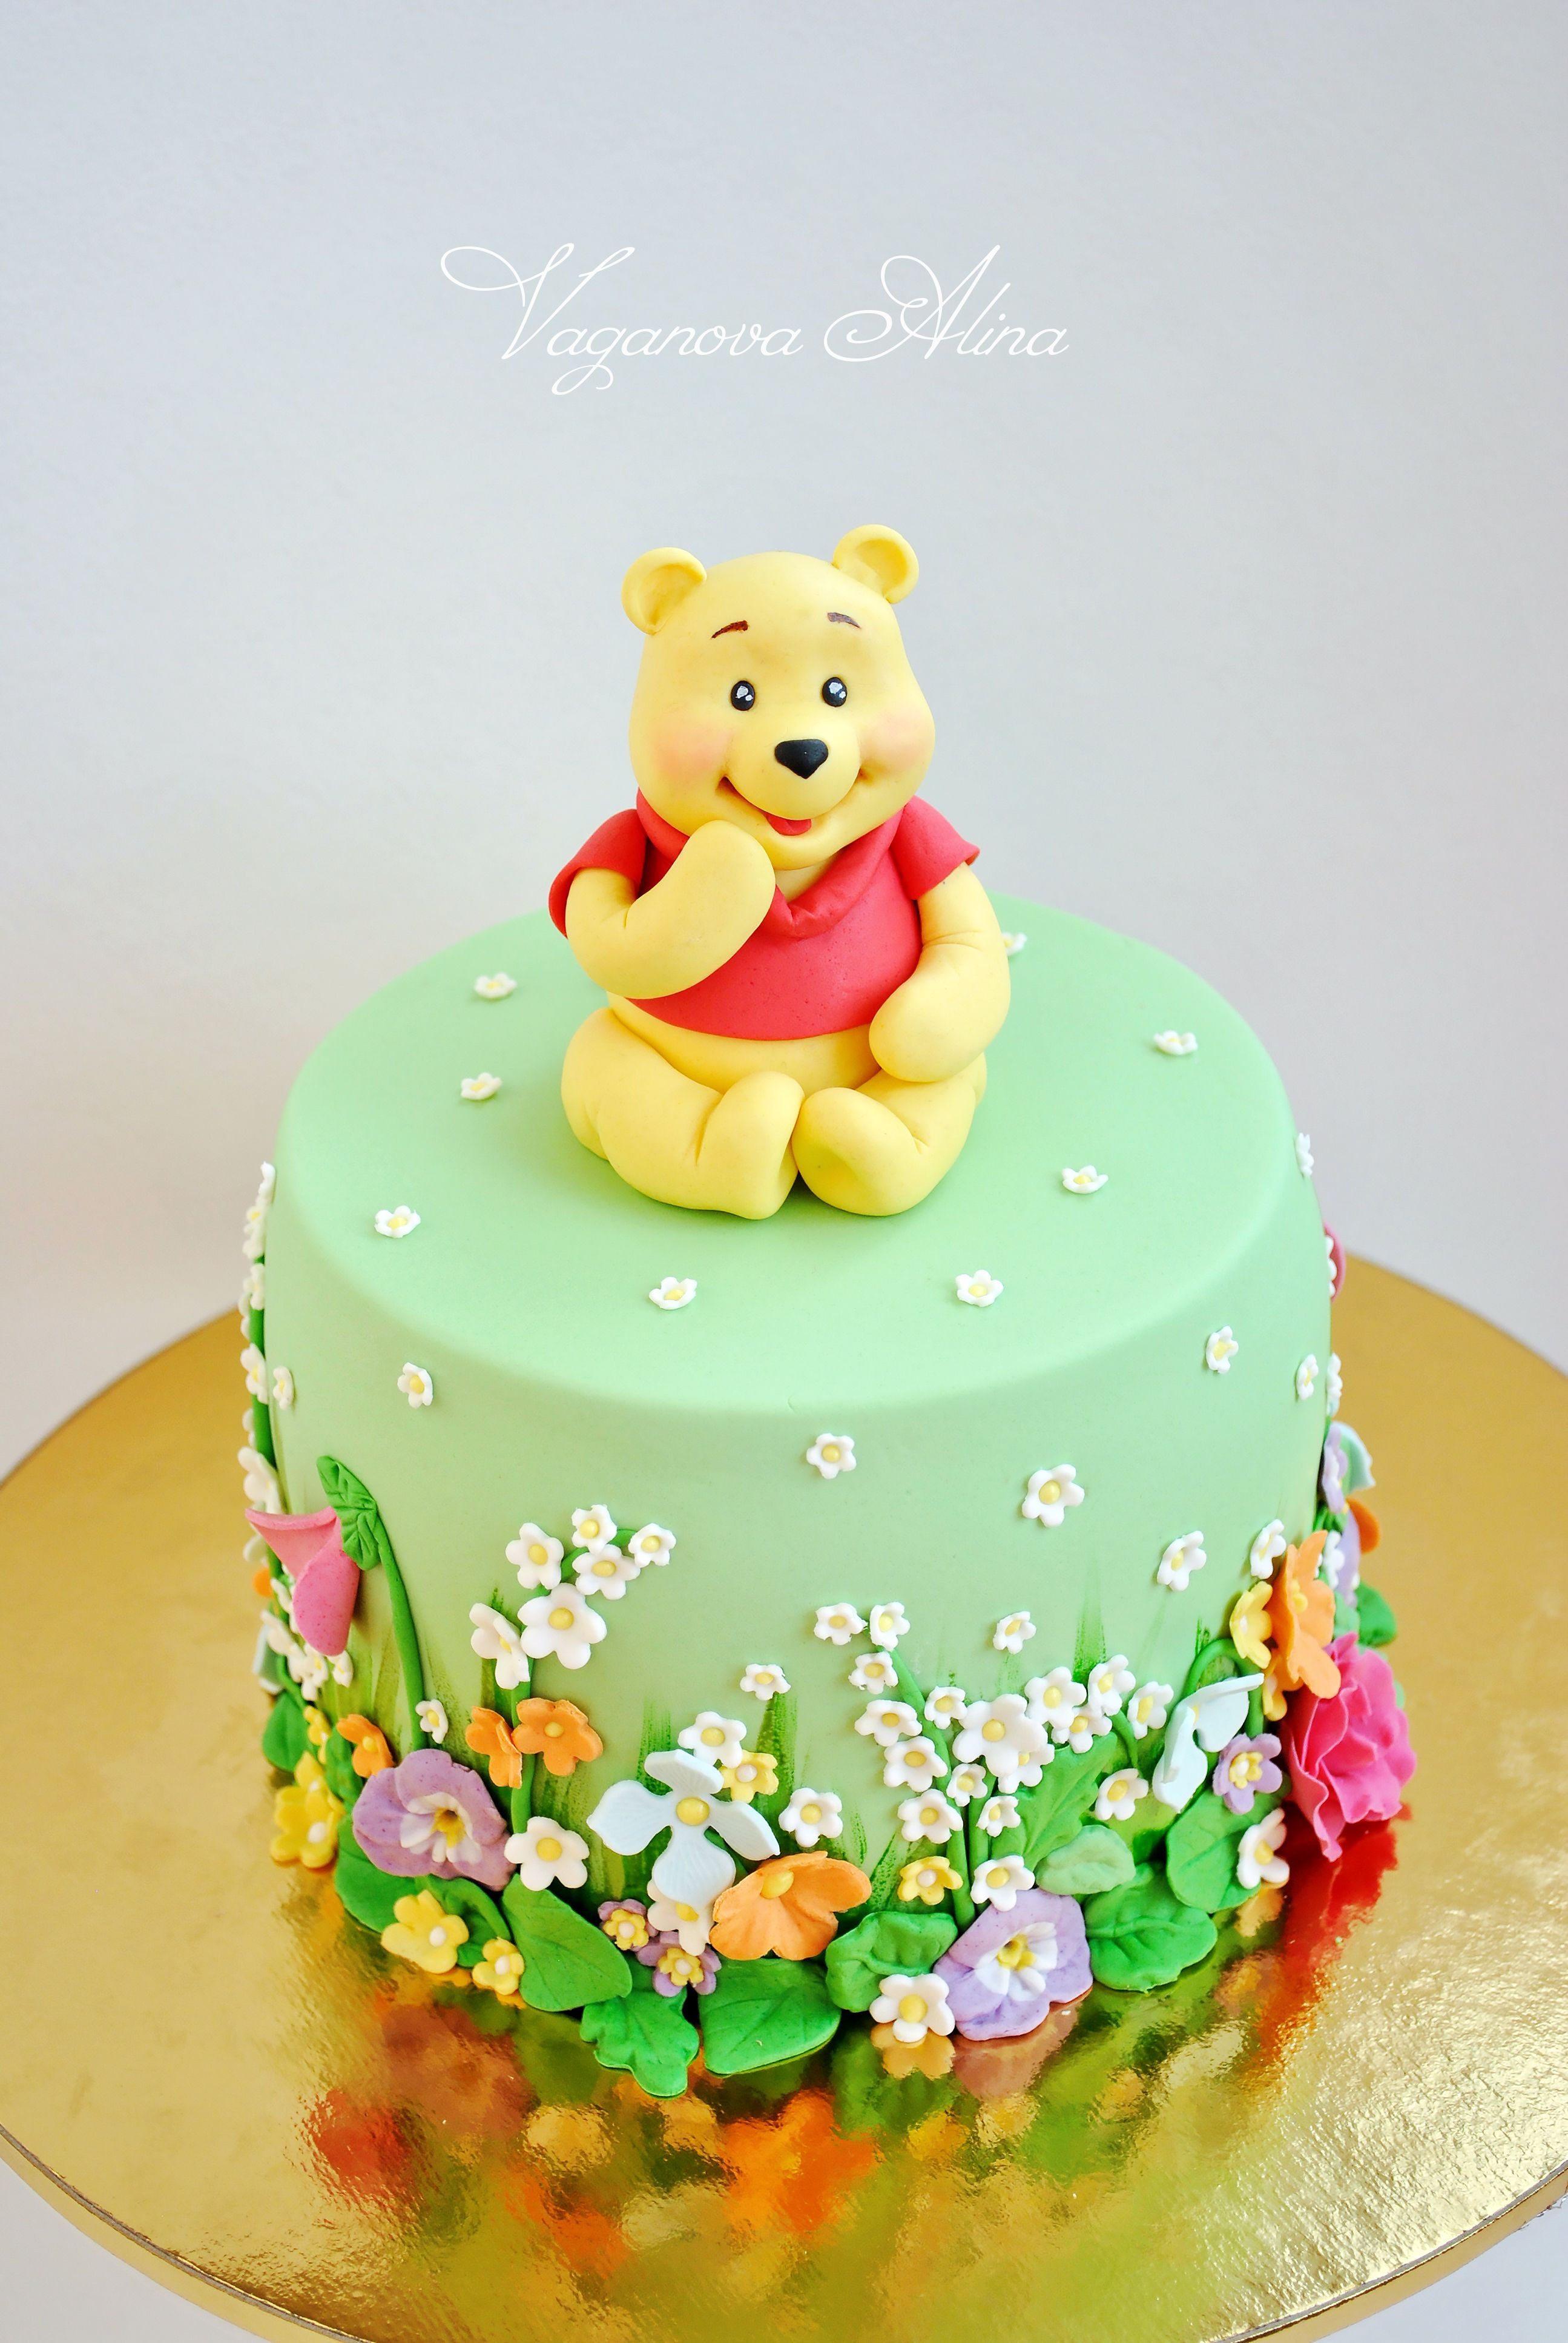 winnie the pooh birthday cake sugar paste fondant flowers cake decorating pinterest. Black Bedroom Furniture Sets. Home Design Ideas